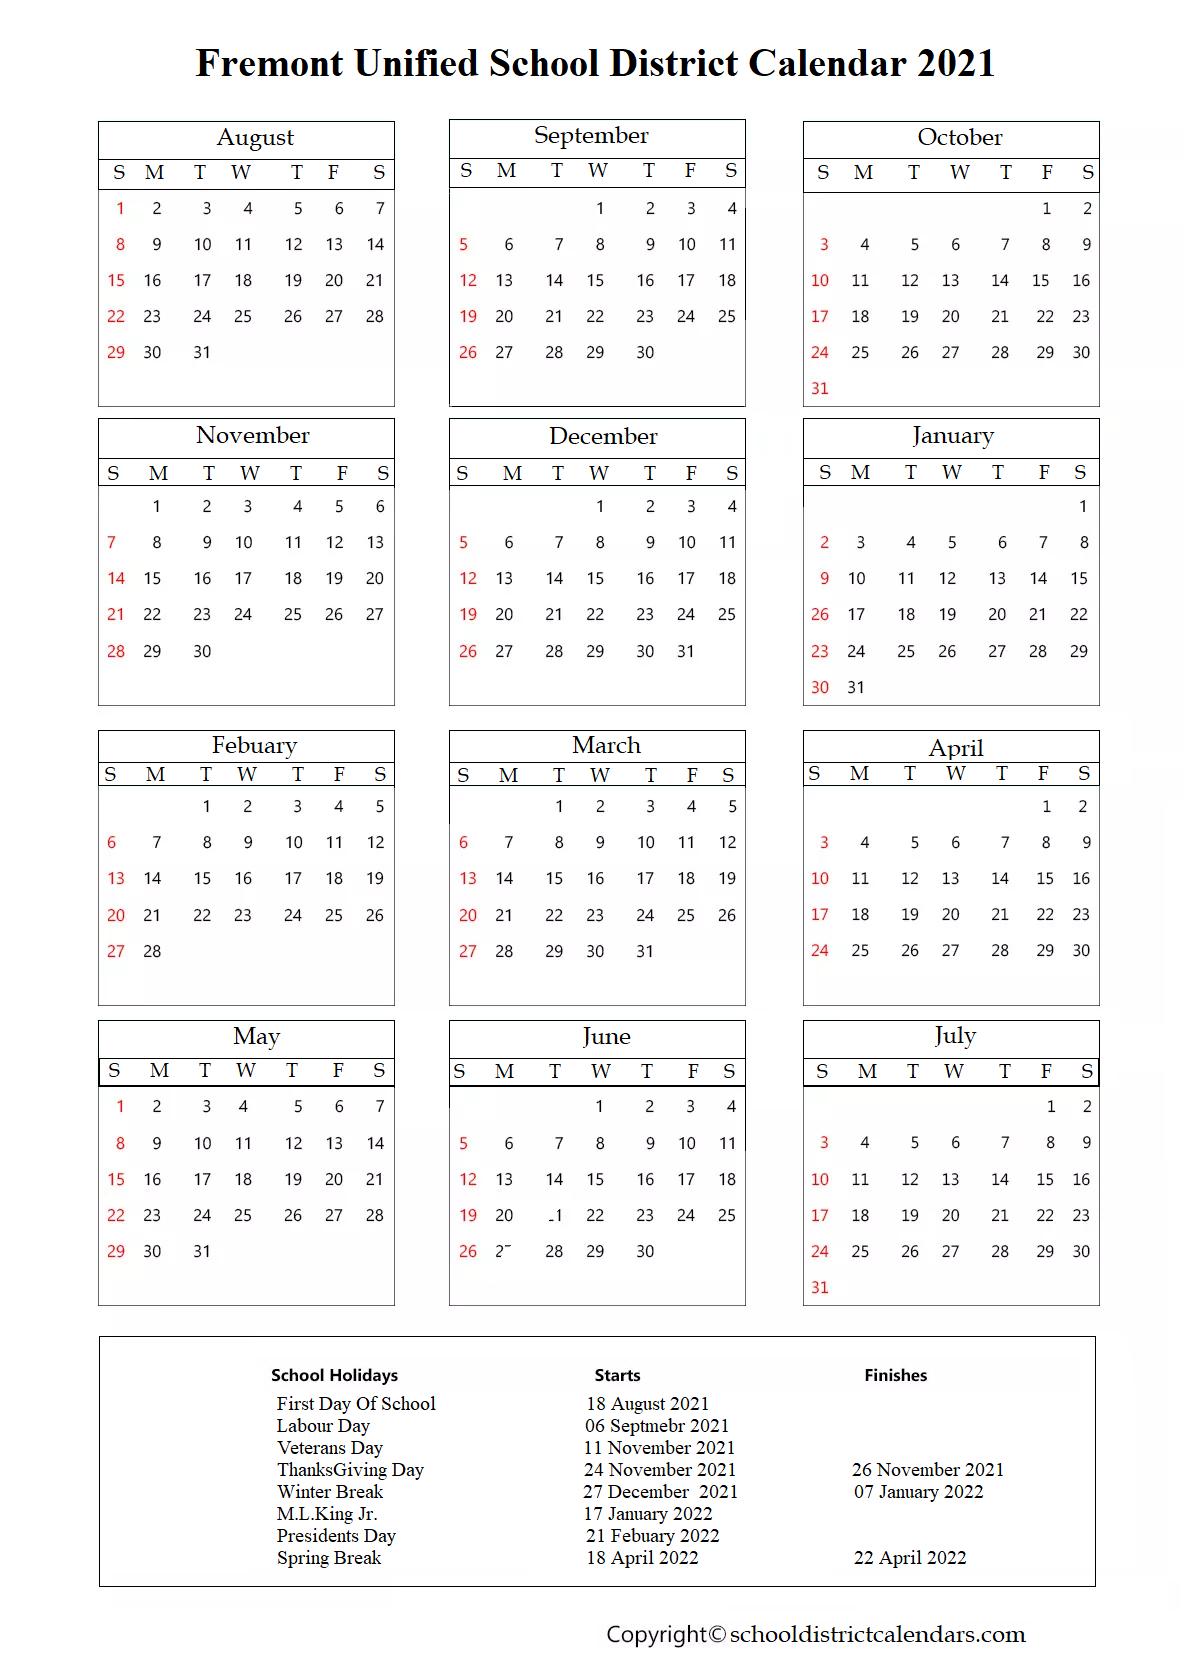 Fremont Unified School District Calendar 2021